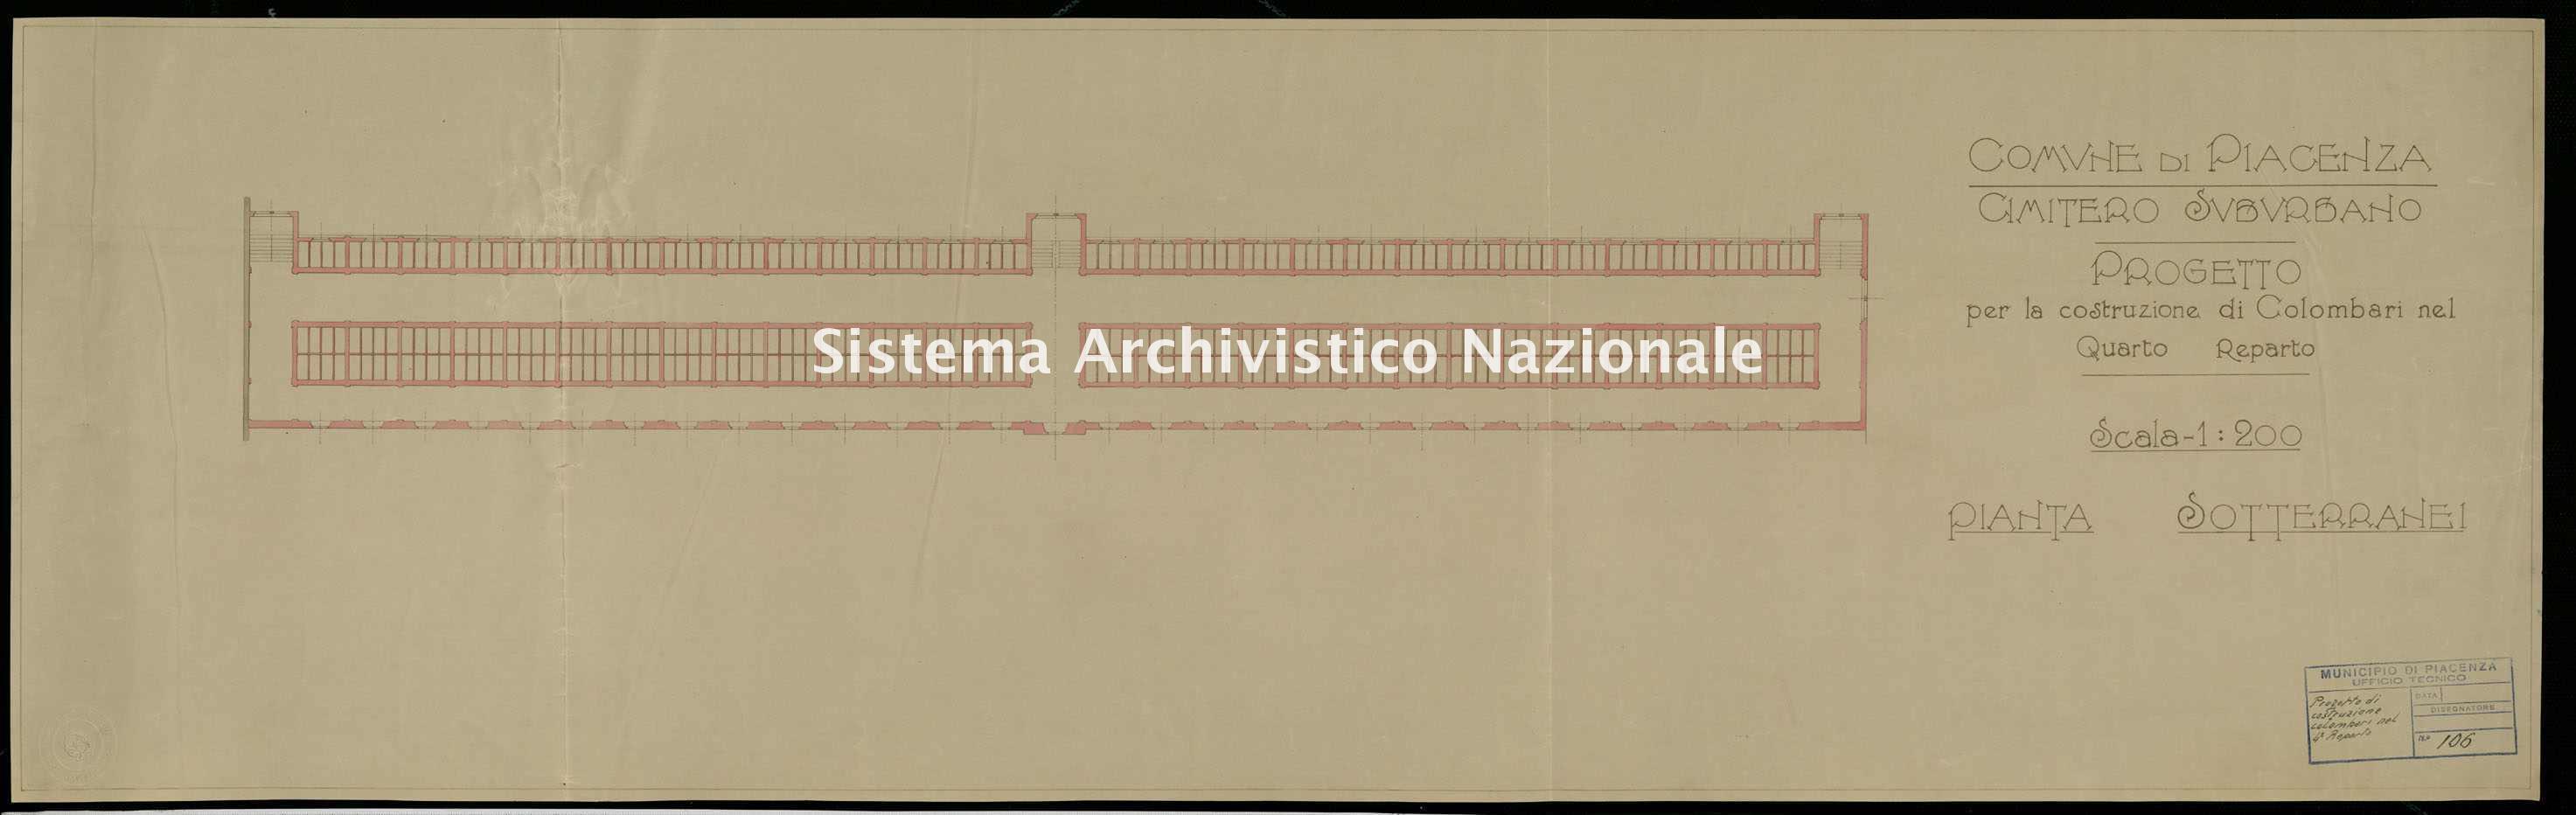 ASPC Mappe, stampe e disegni, n. 5221